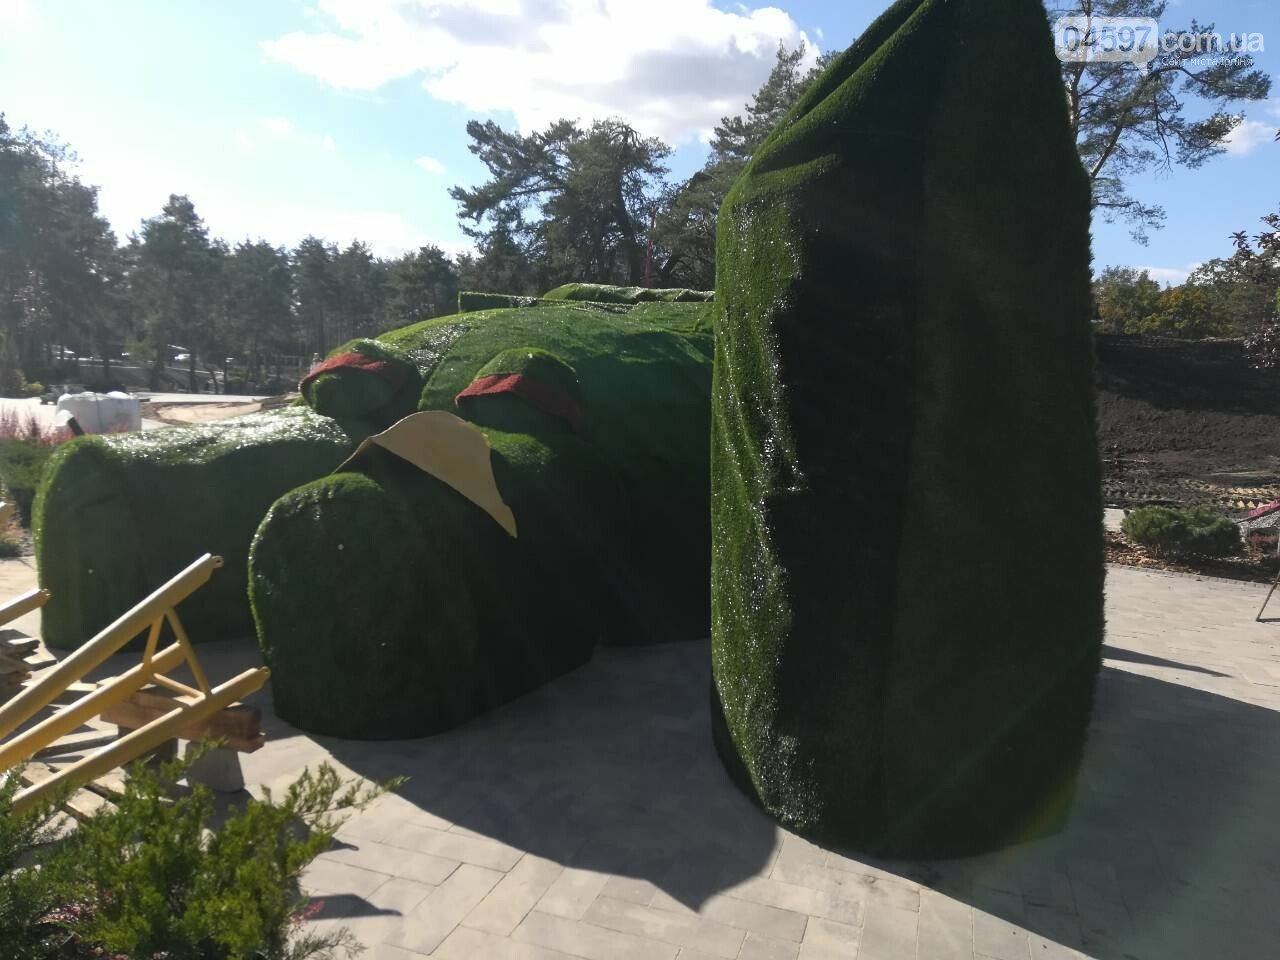 Бегемот, жаба чи курча: хто оселиться в парку Перемоги?, фото-1